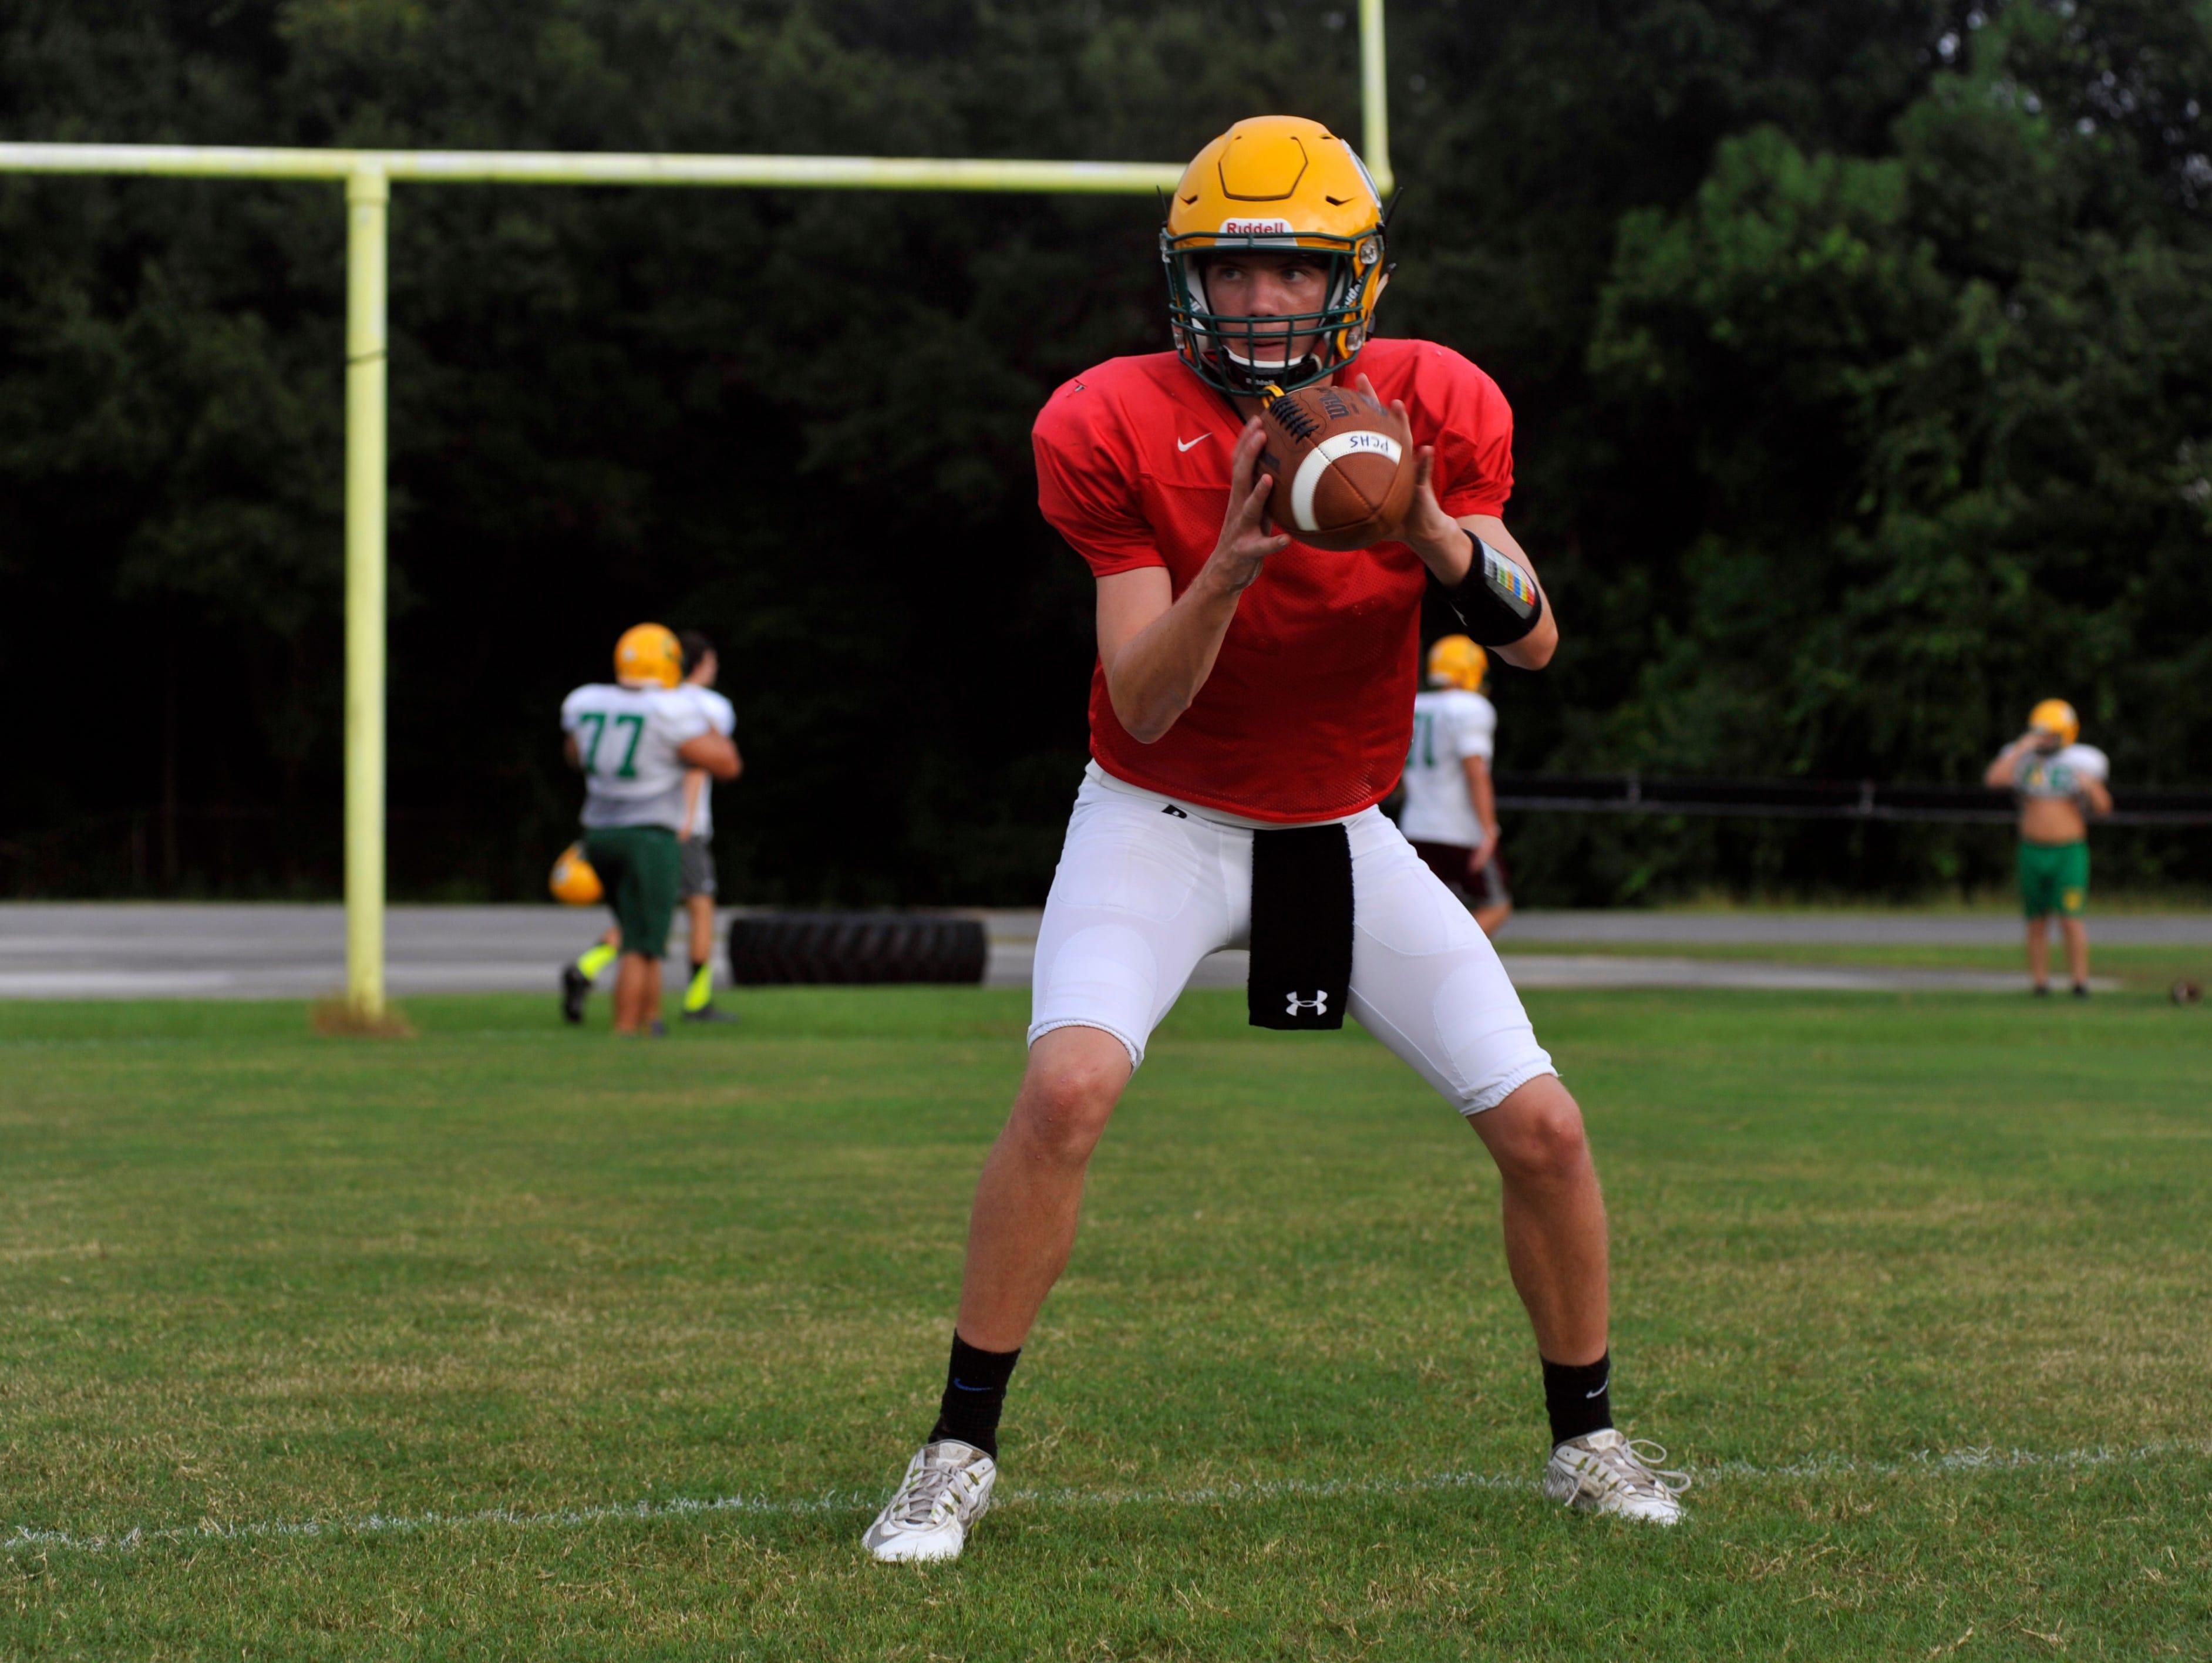 Pensacola Catholic quarterback Garrett Foley takes snaps during practice on Aug. 24, 2016.